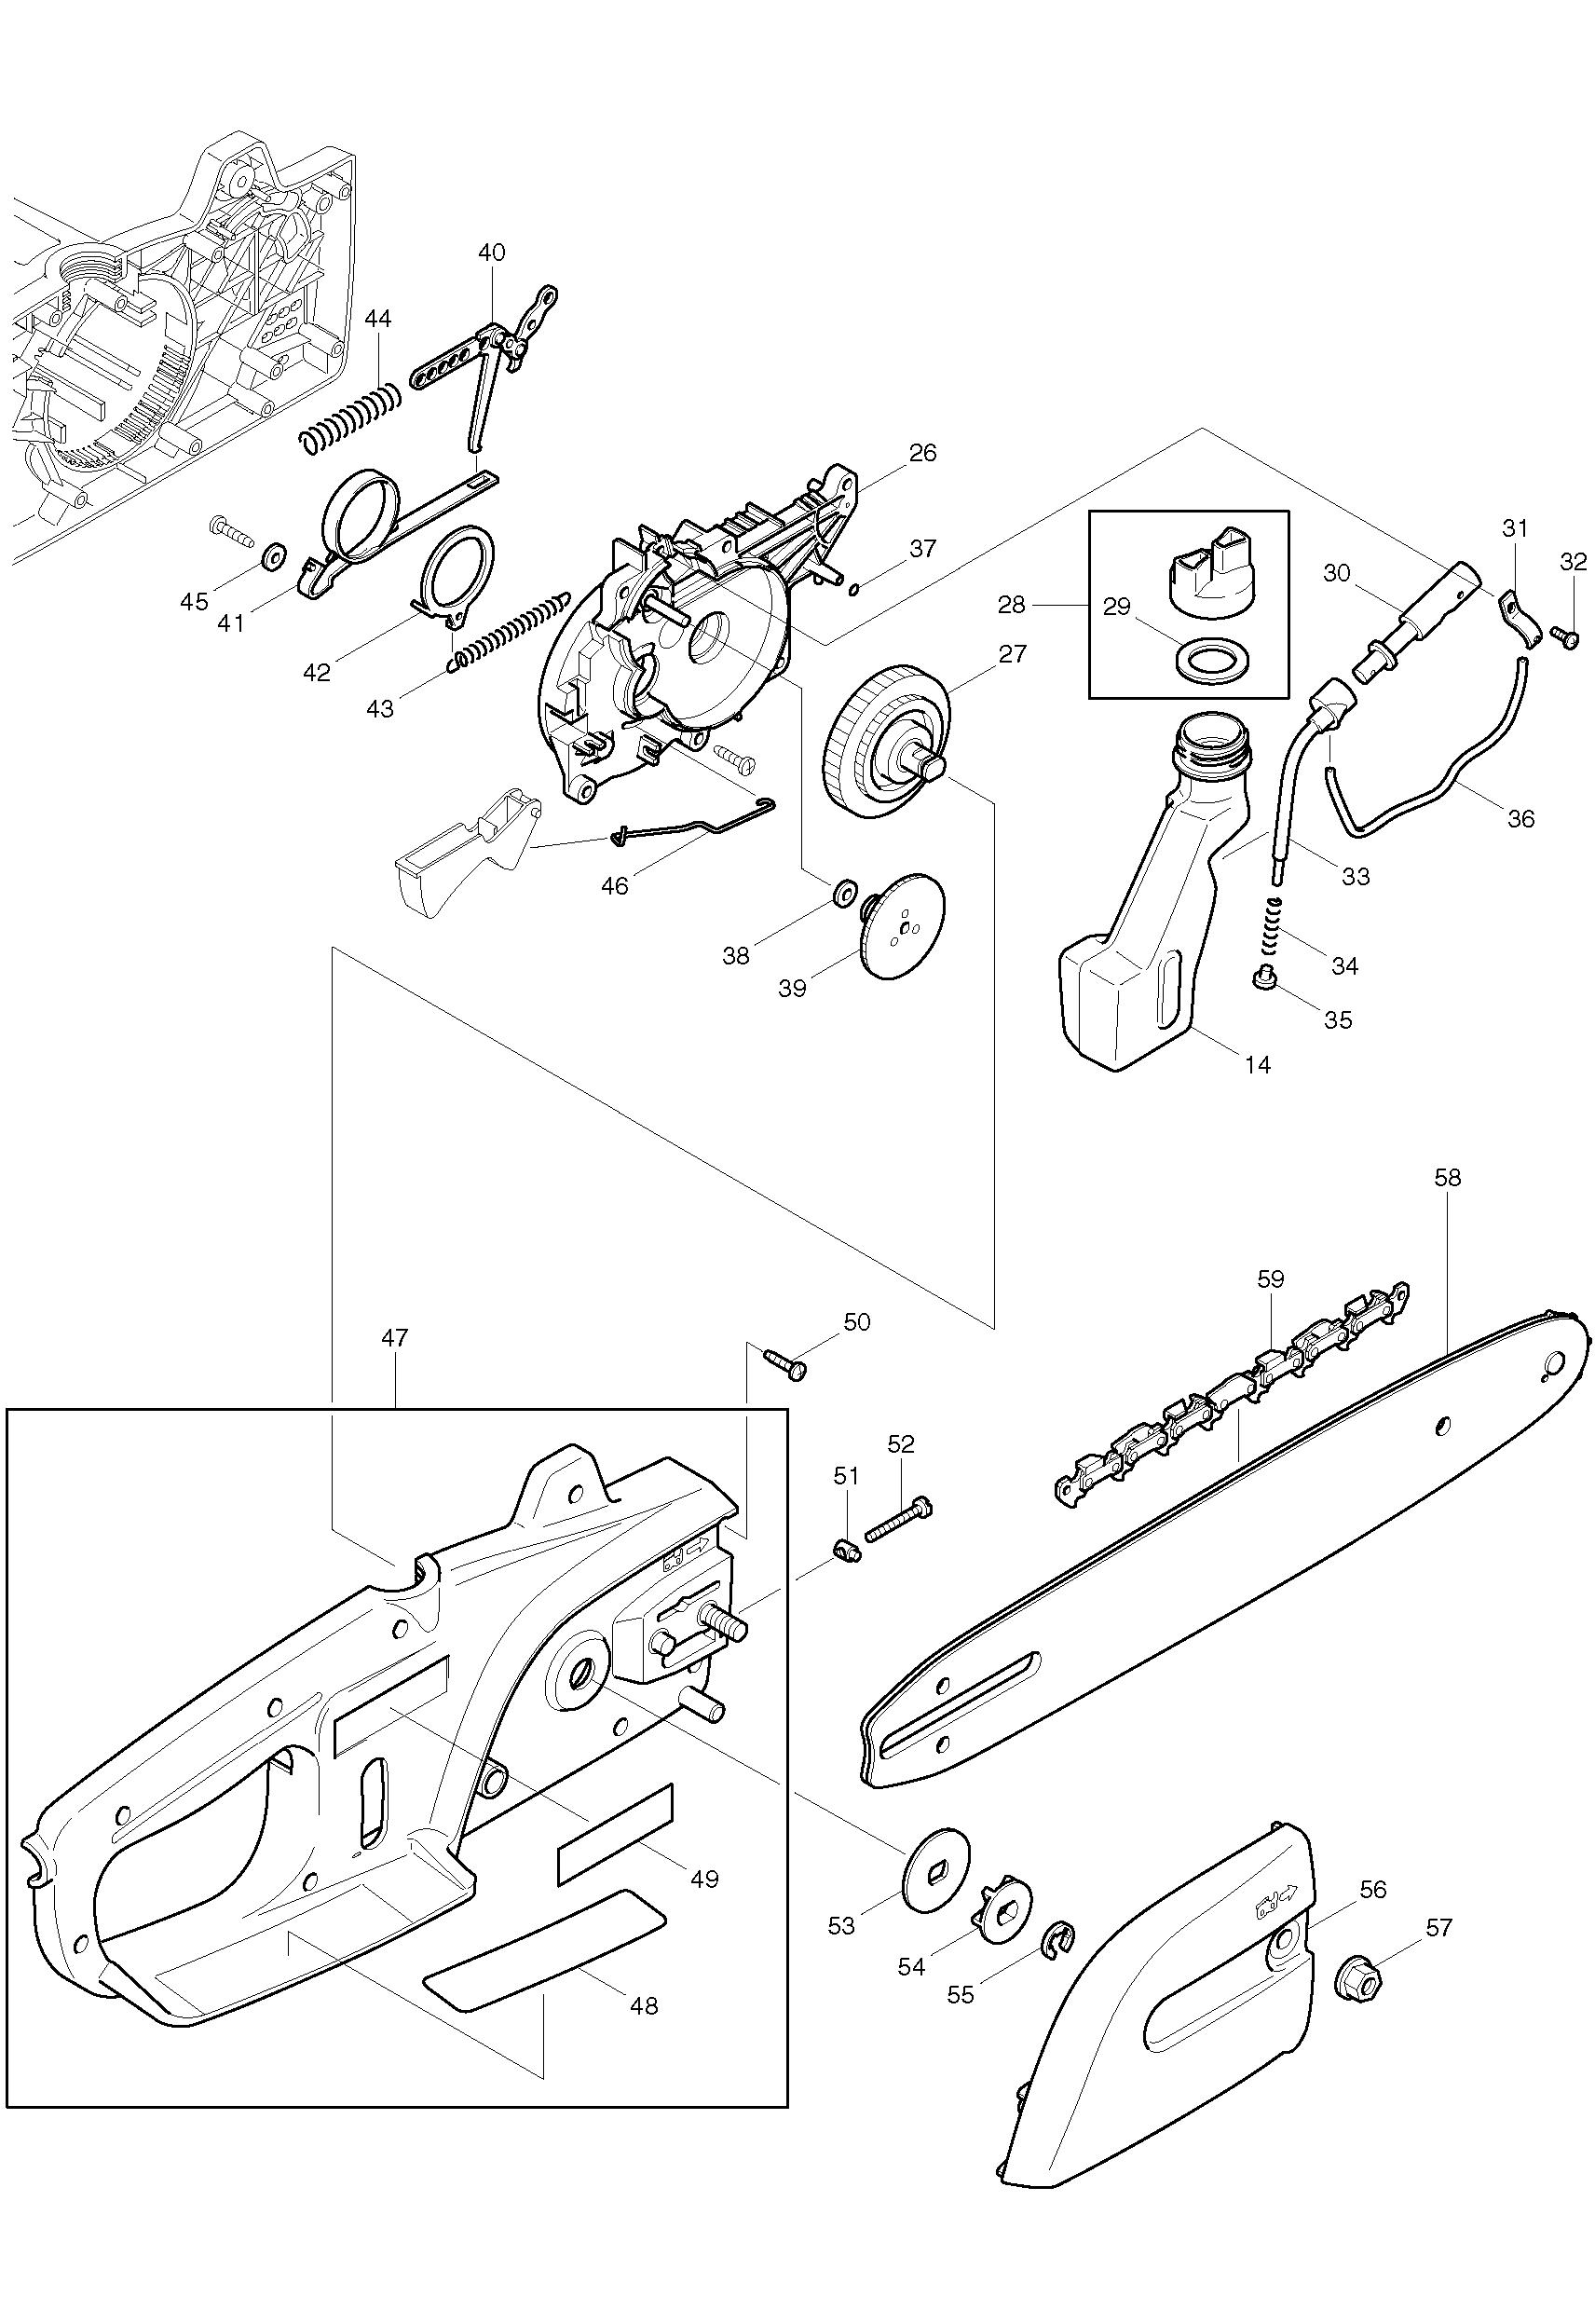 Электропила чемпион ремонт своими руками